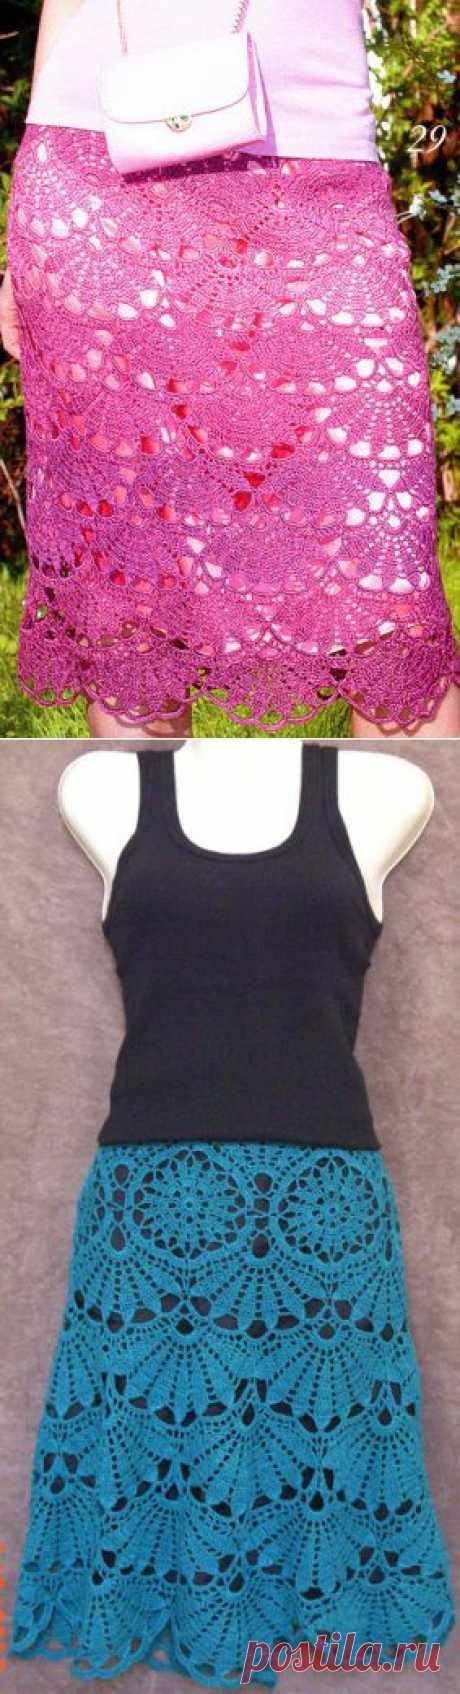 Ажурная юбка крючком схема.